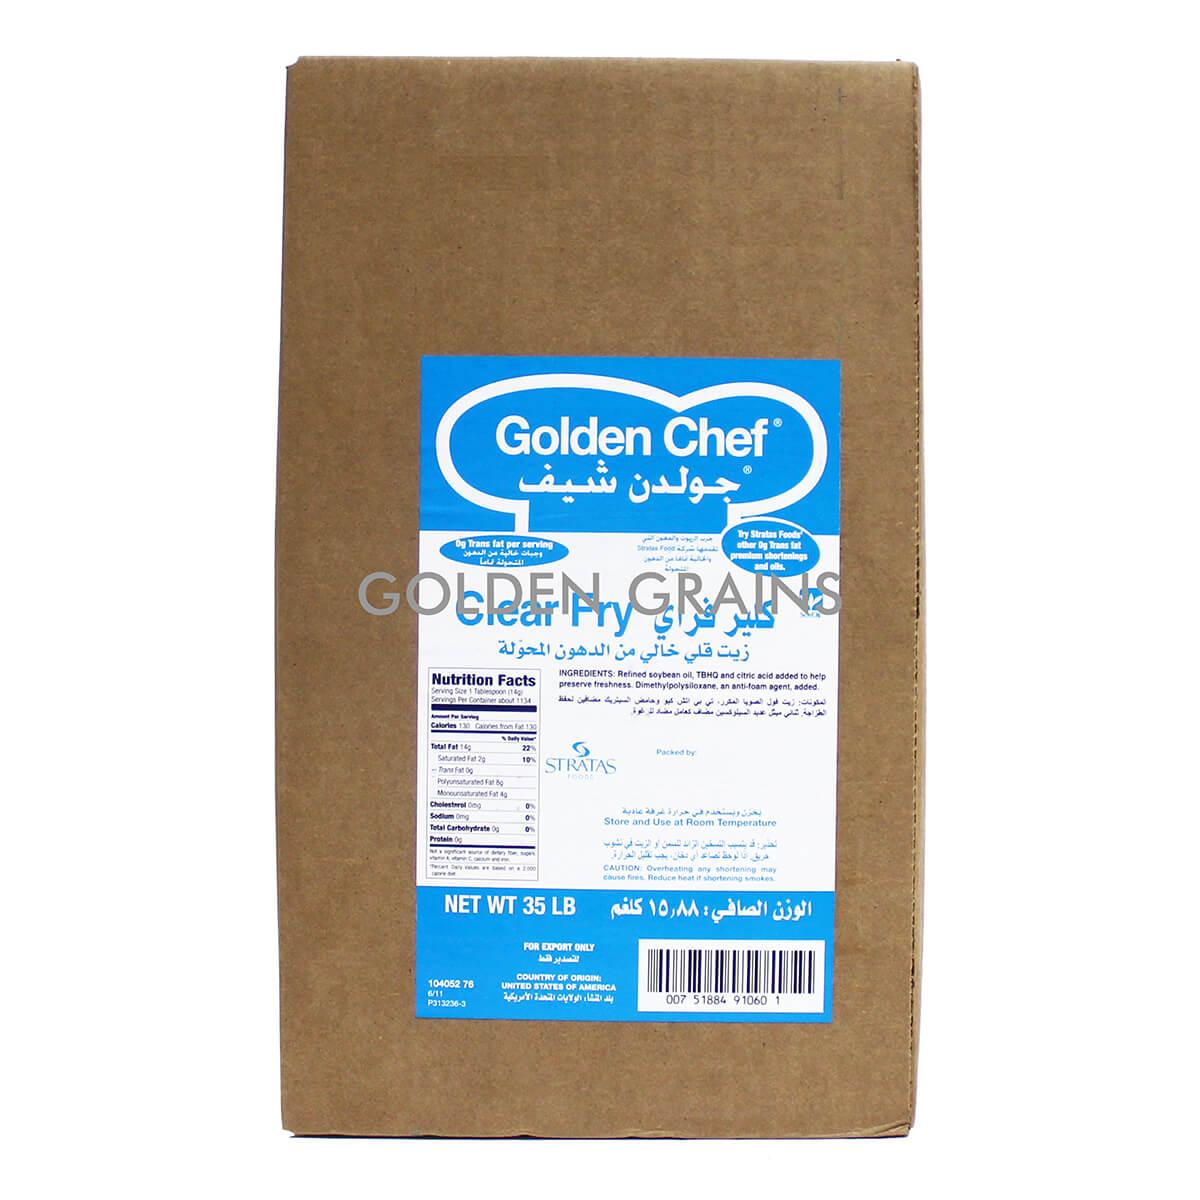 Golden Grains Dubai Export - Golden Chef - Clear Fry - Front.jpg